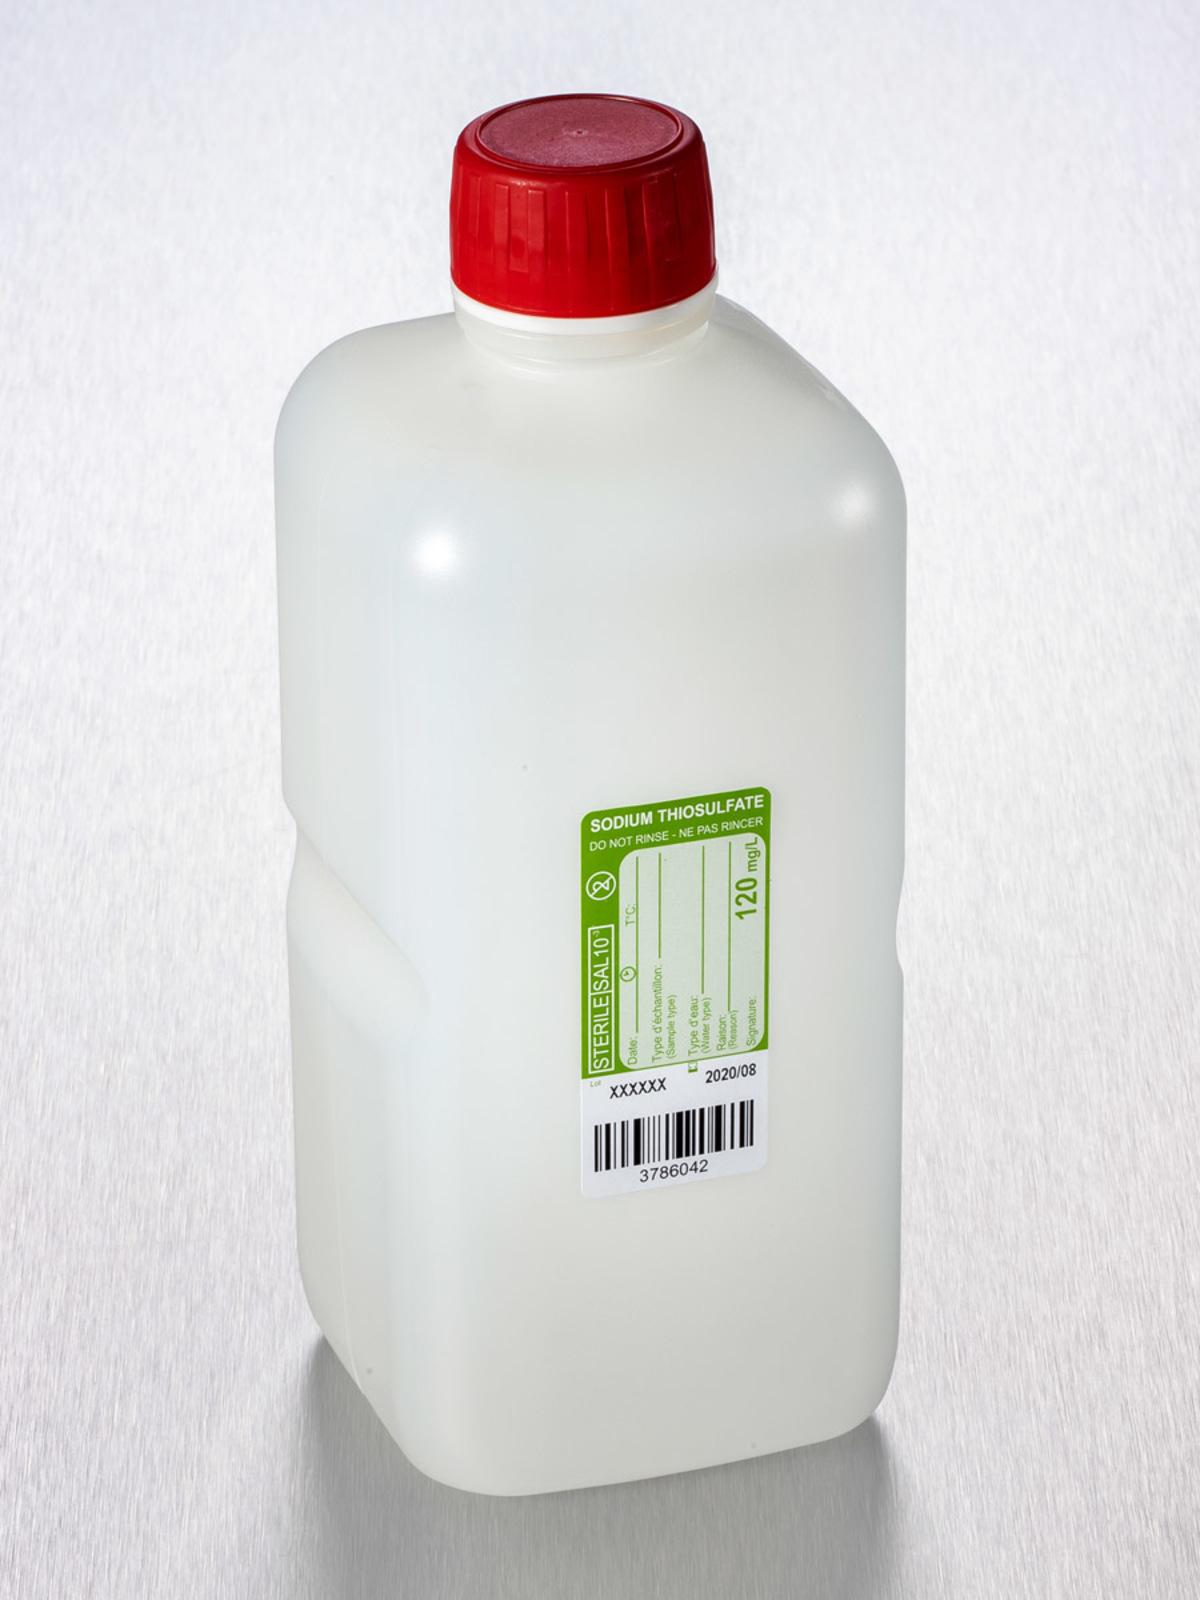 Corning® Gosselin™ Water Sampling Square HDPE Bottle, 1 L, Graduated